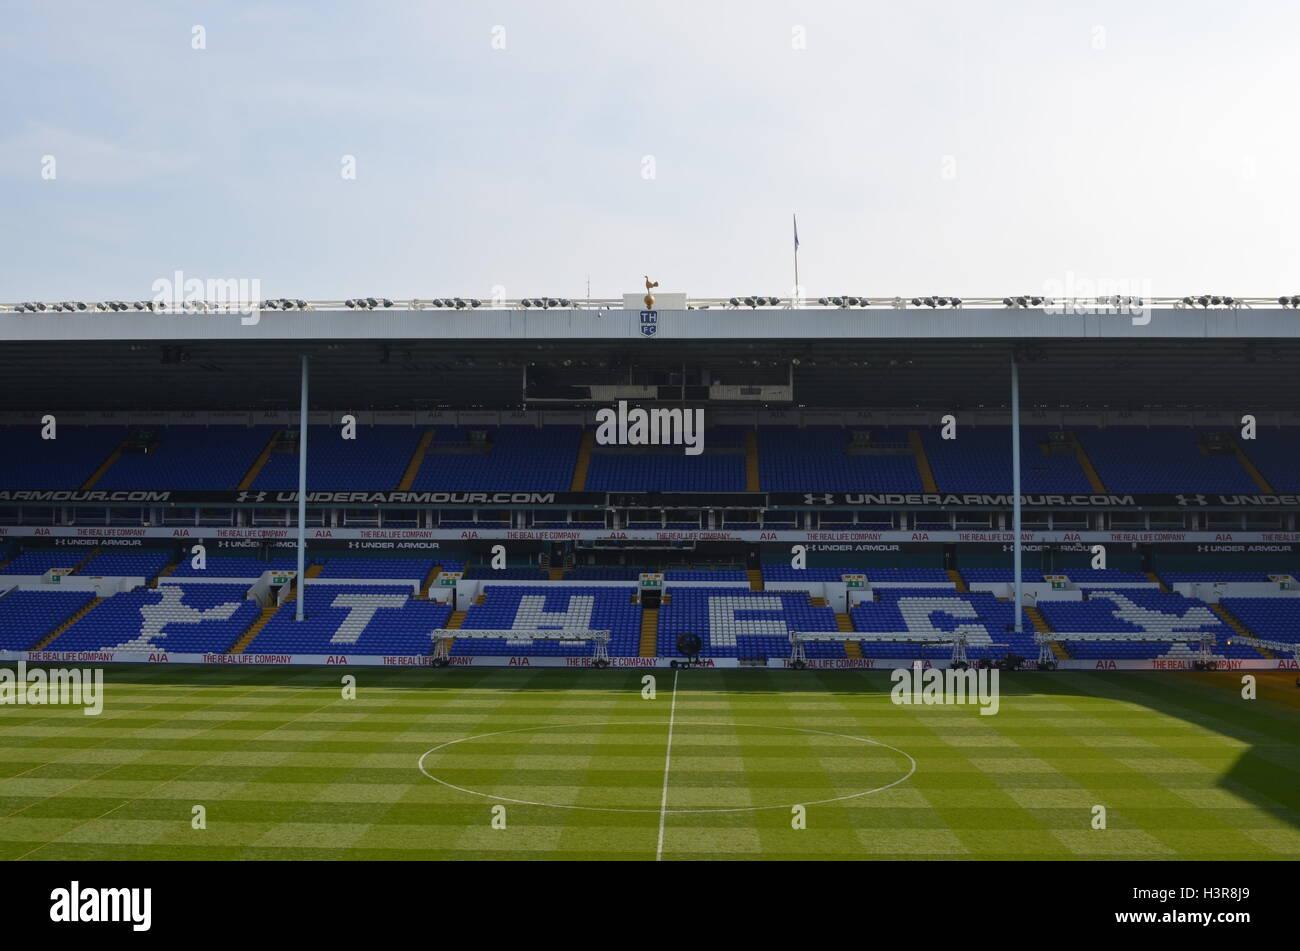 White Hart Lane, the football stadium of Tottenham Hotspur. - Stock Image